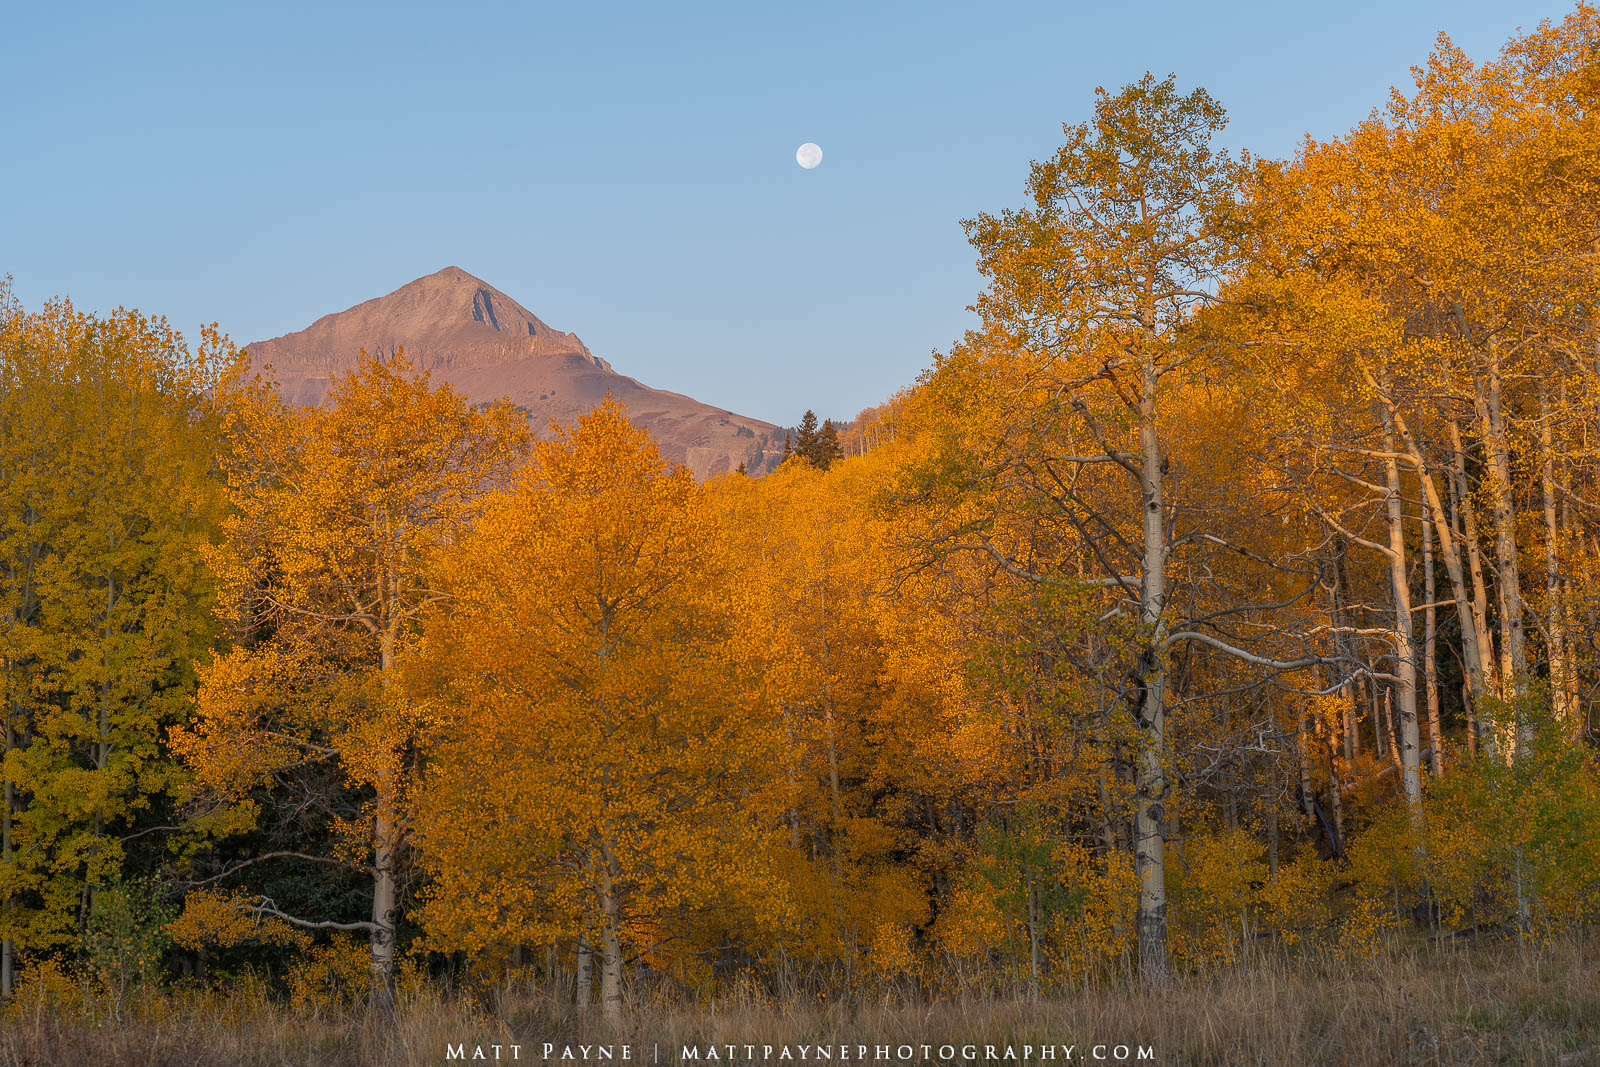 Aspen Trees, Autumn, Colorado, Fall, Fall Colors, Landscape, Moon, Mountains, San Juan Mountains, landscape photography, photo